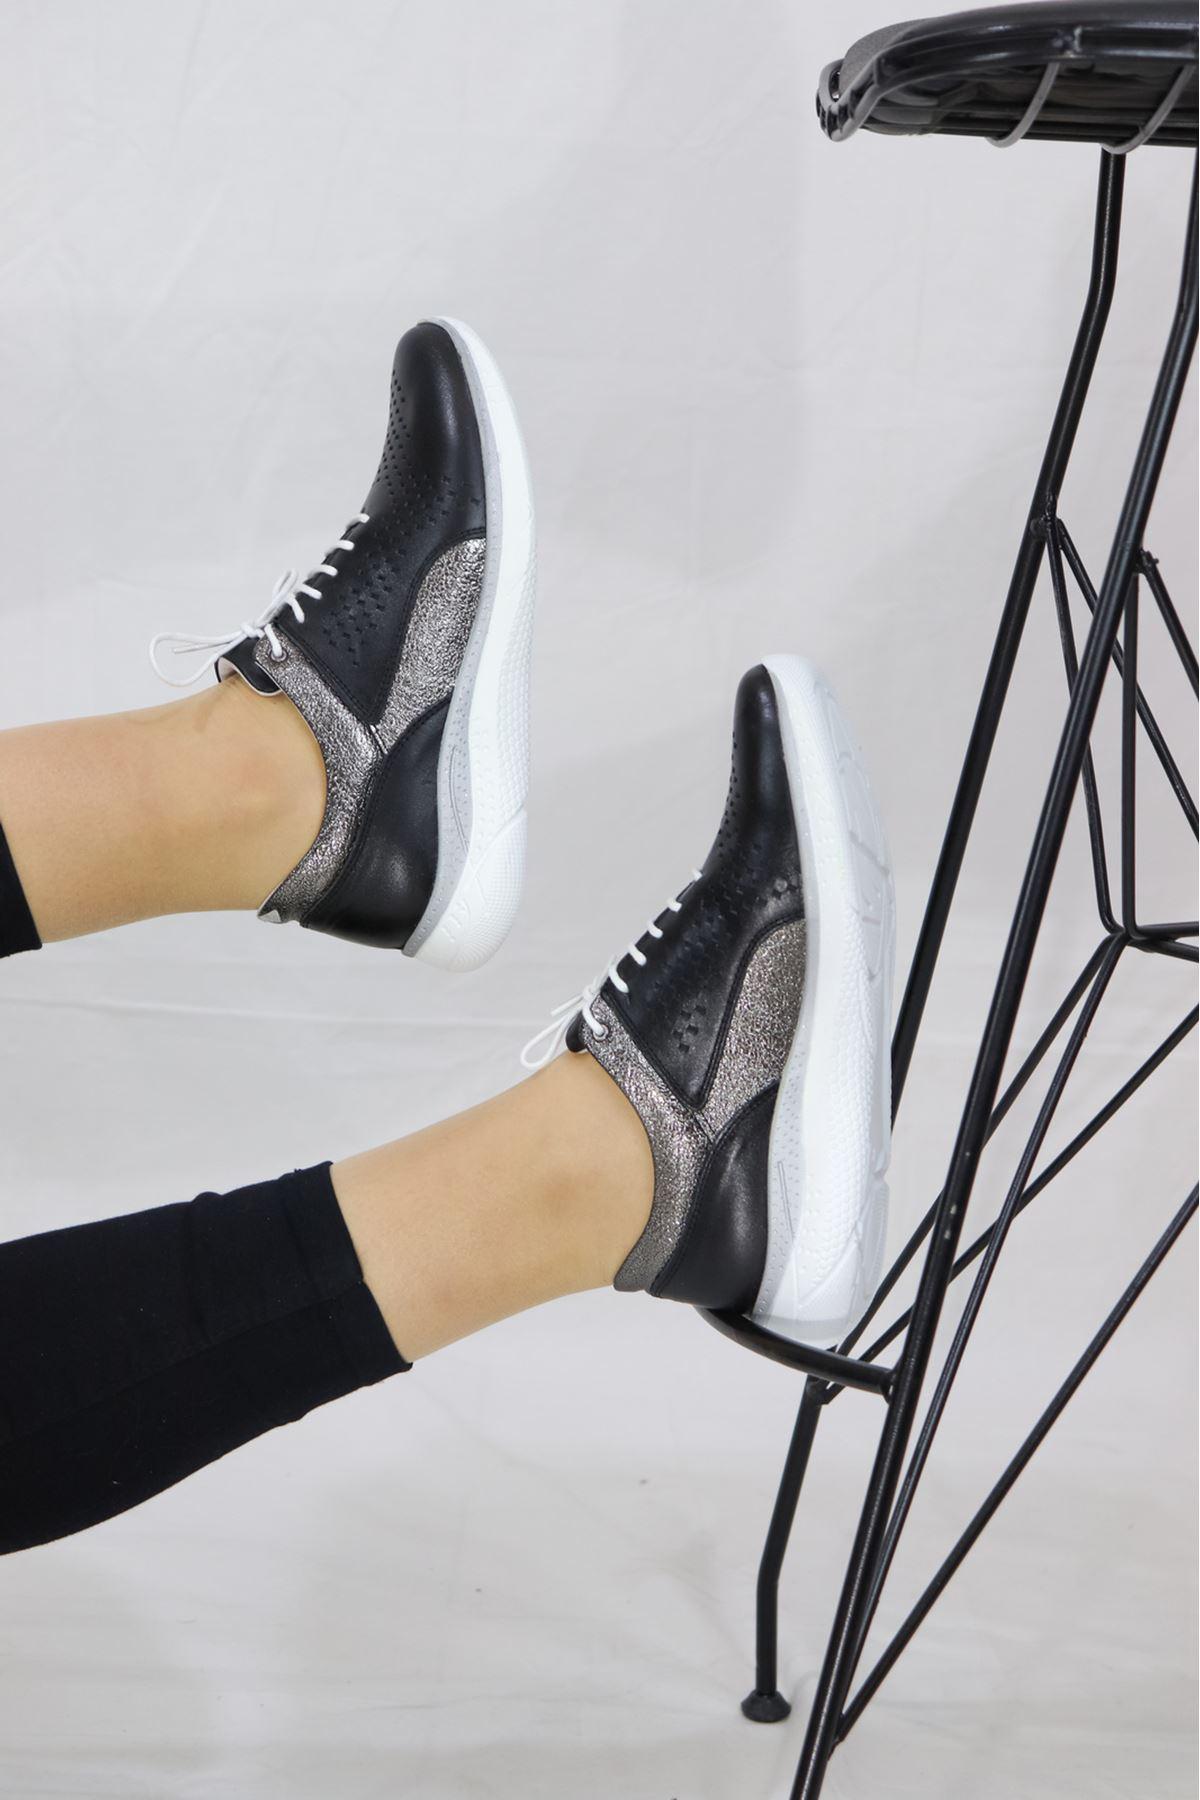 Venüs - 13789Y - Siyah Platin Kadın Ayakkabısı